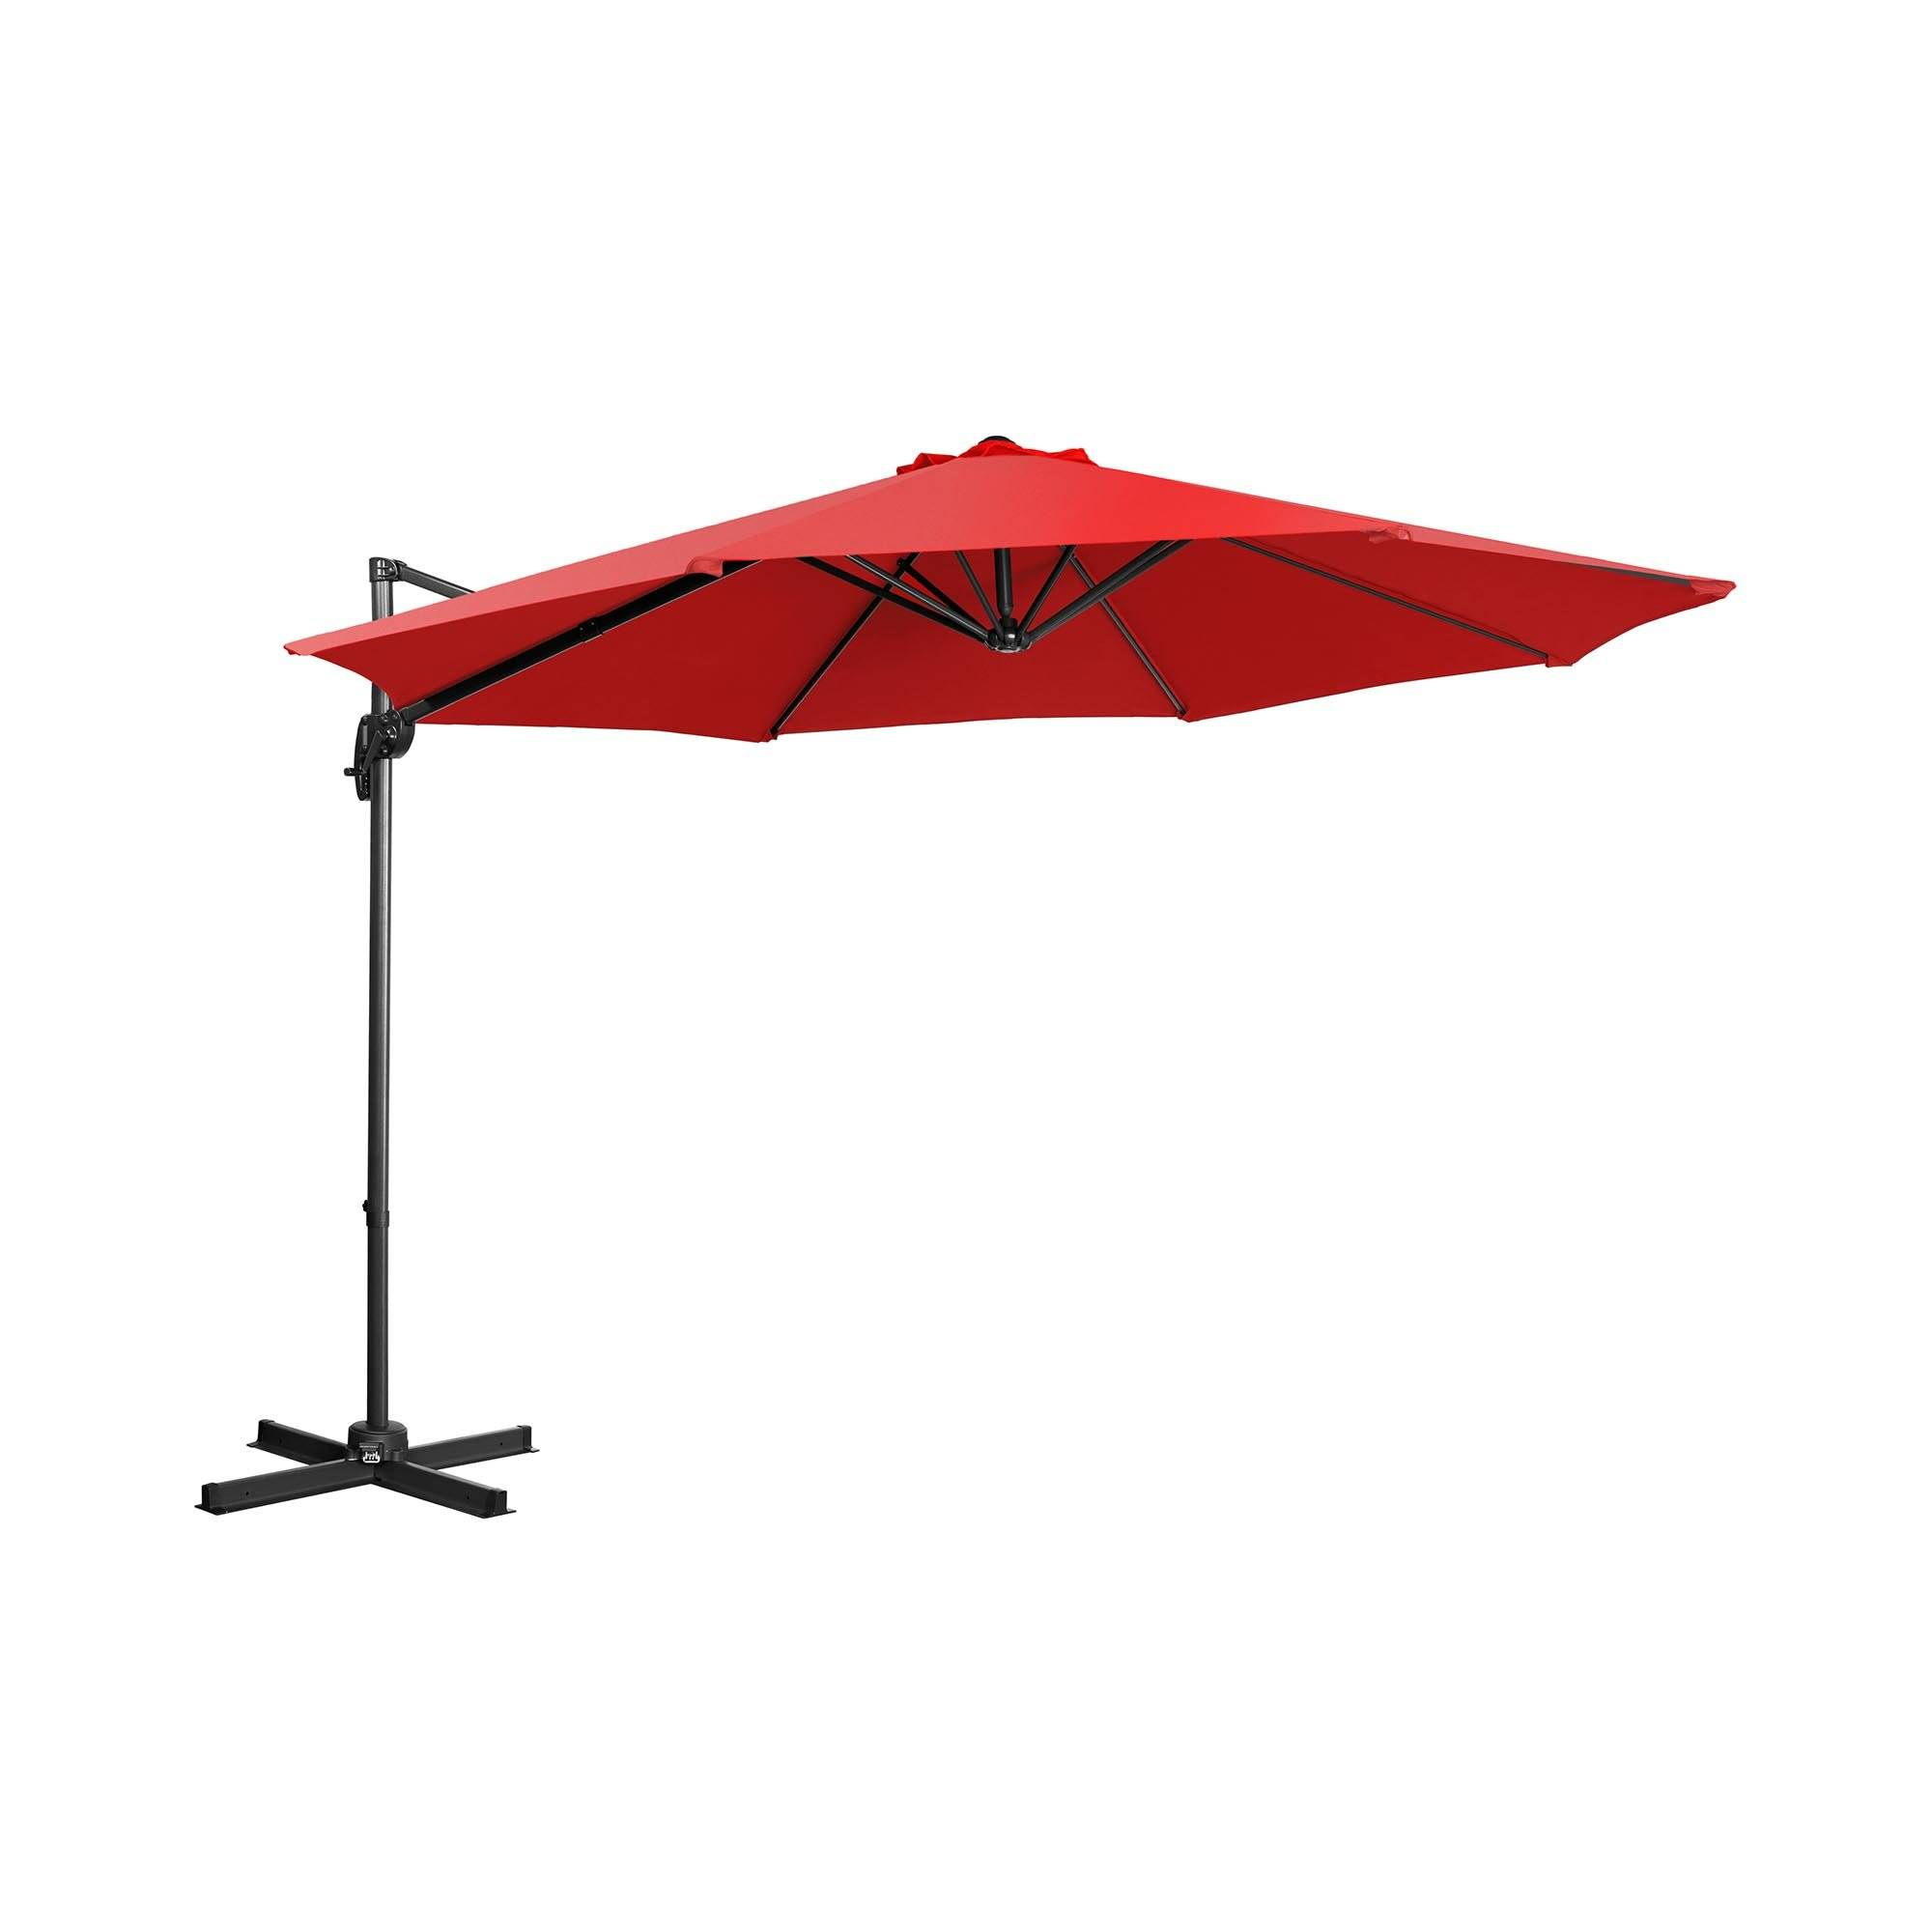 Uniprodo Hanging Parasol - red - round - Ã 300 cm - rotatable